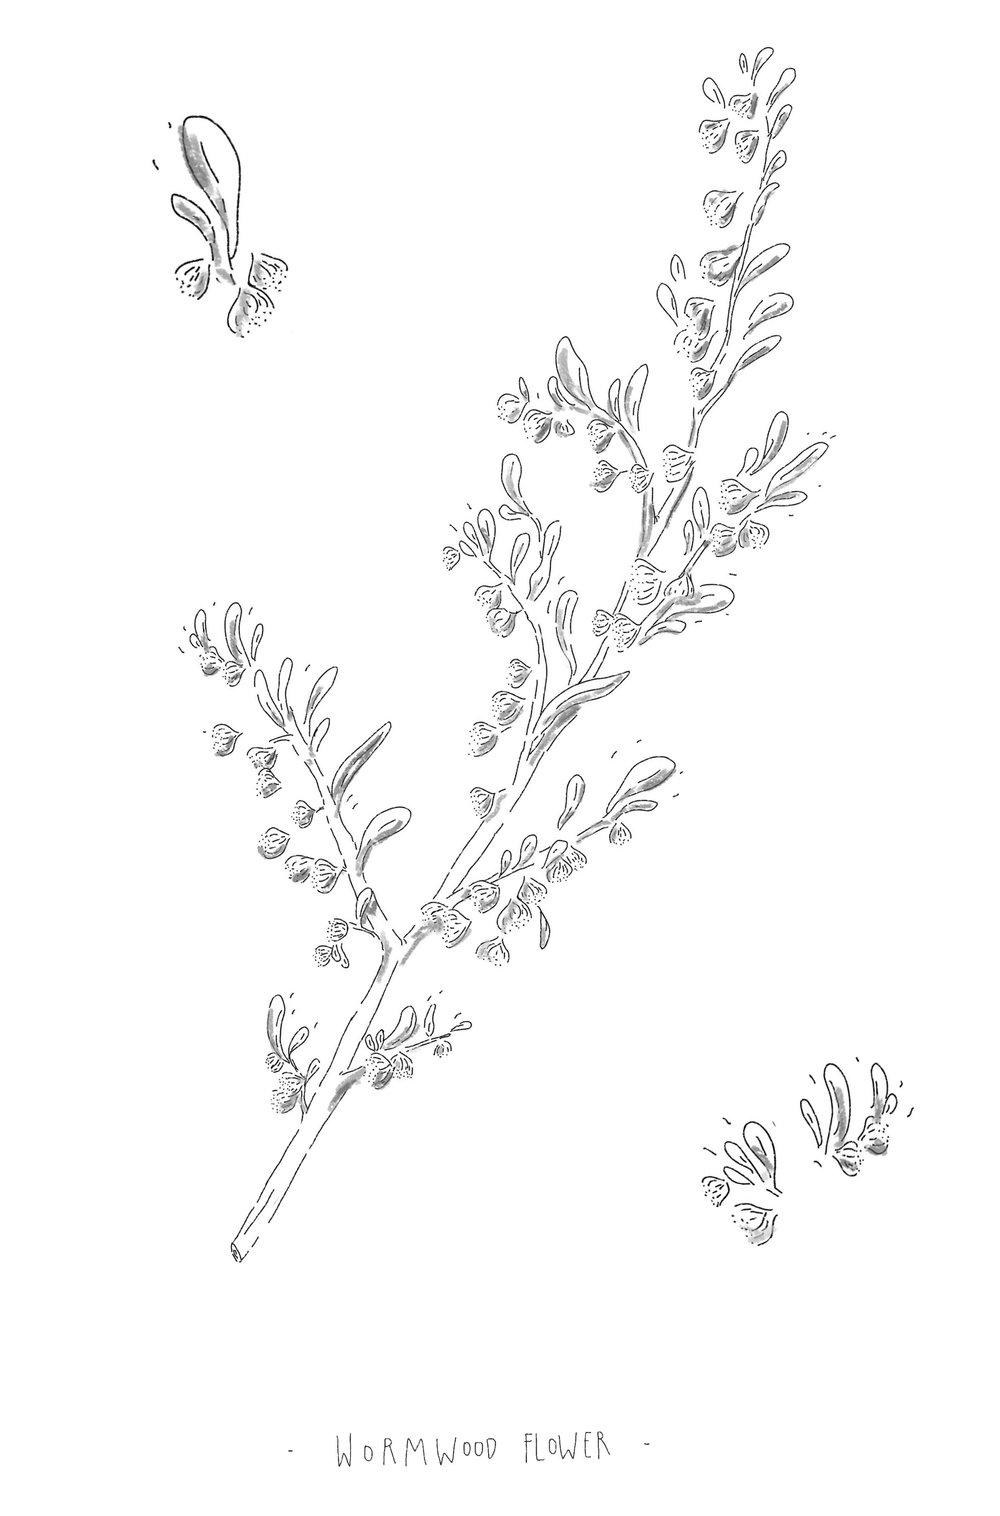 wormwood flower m.jpg